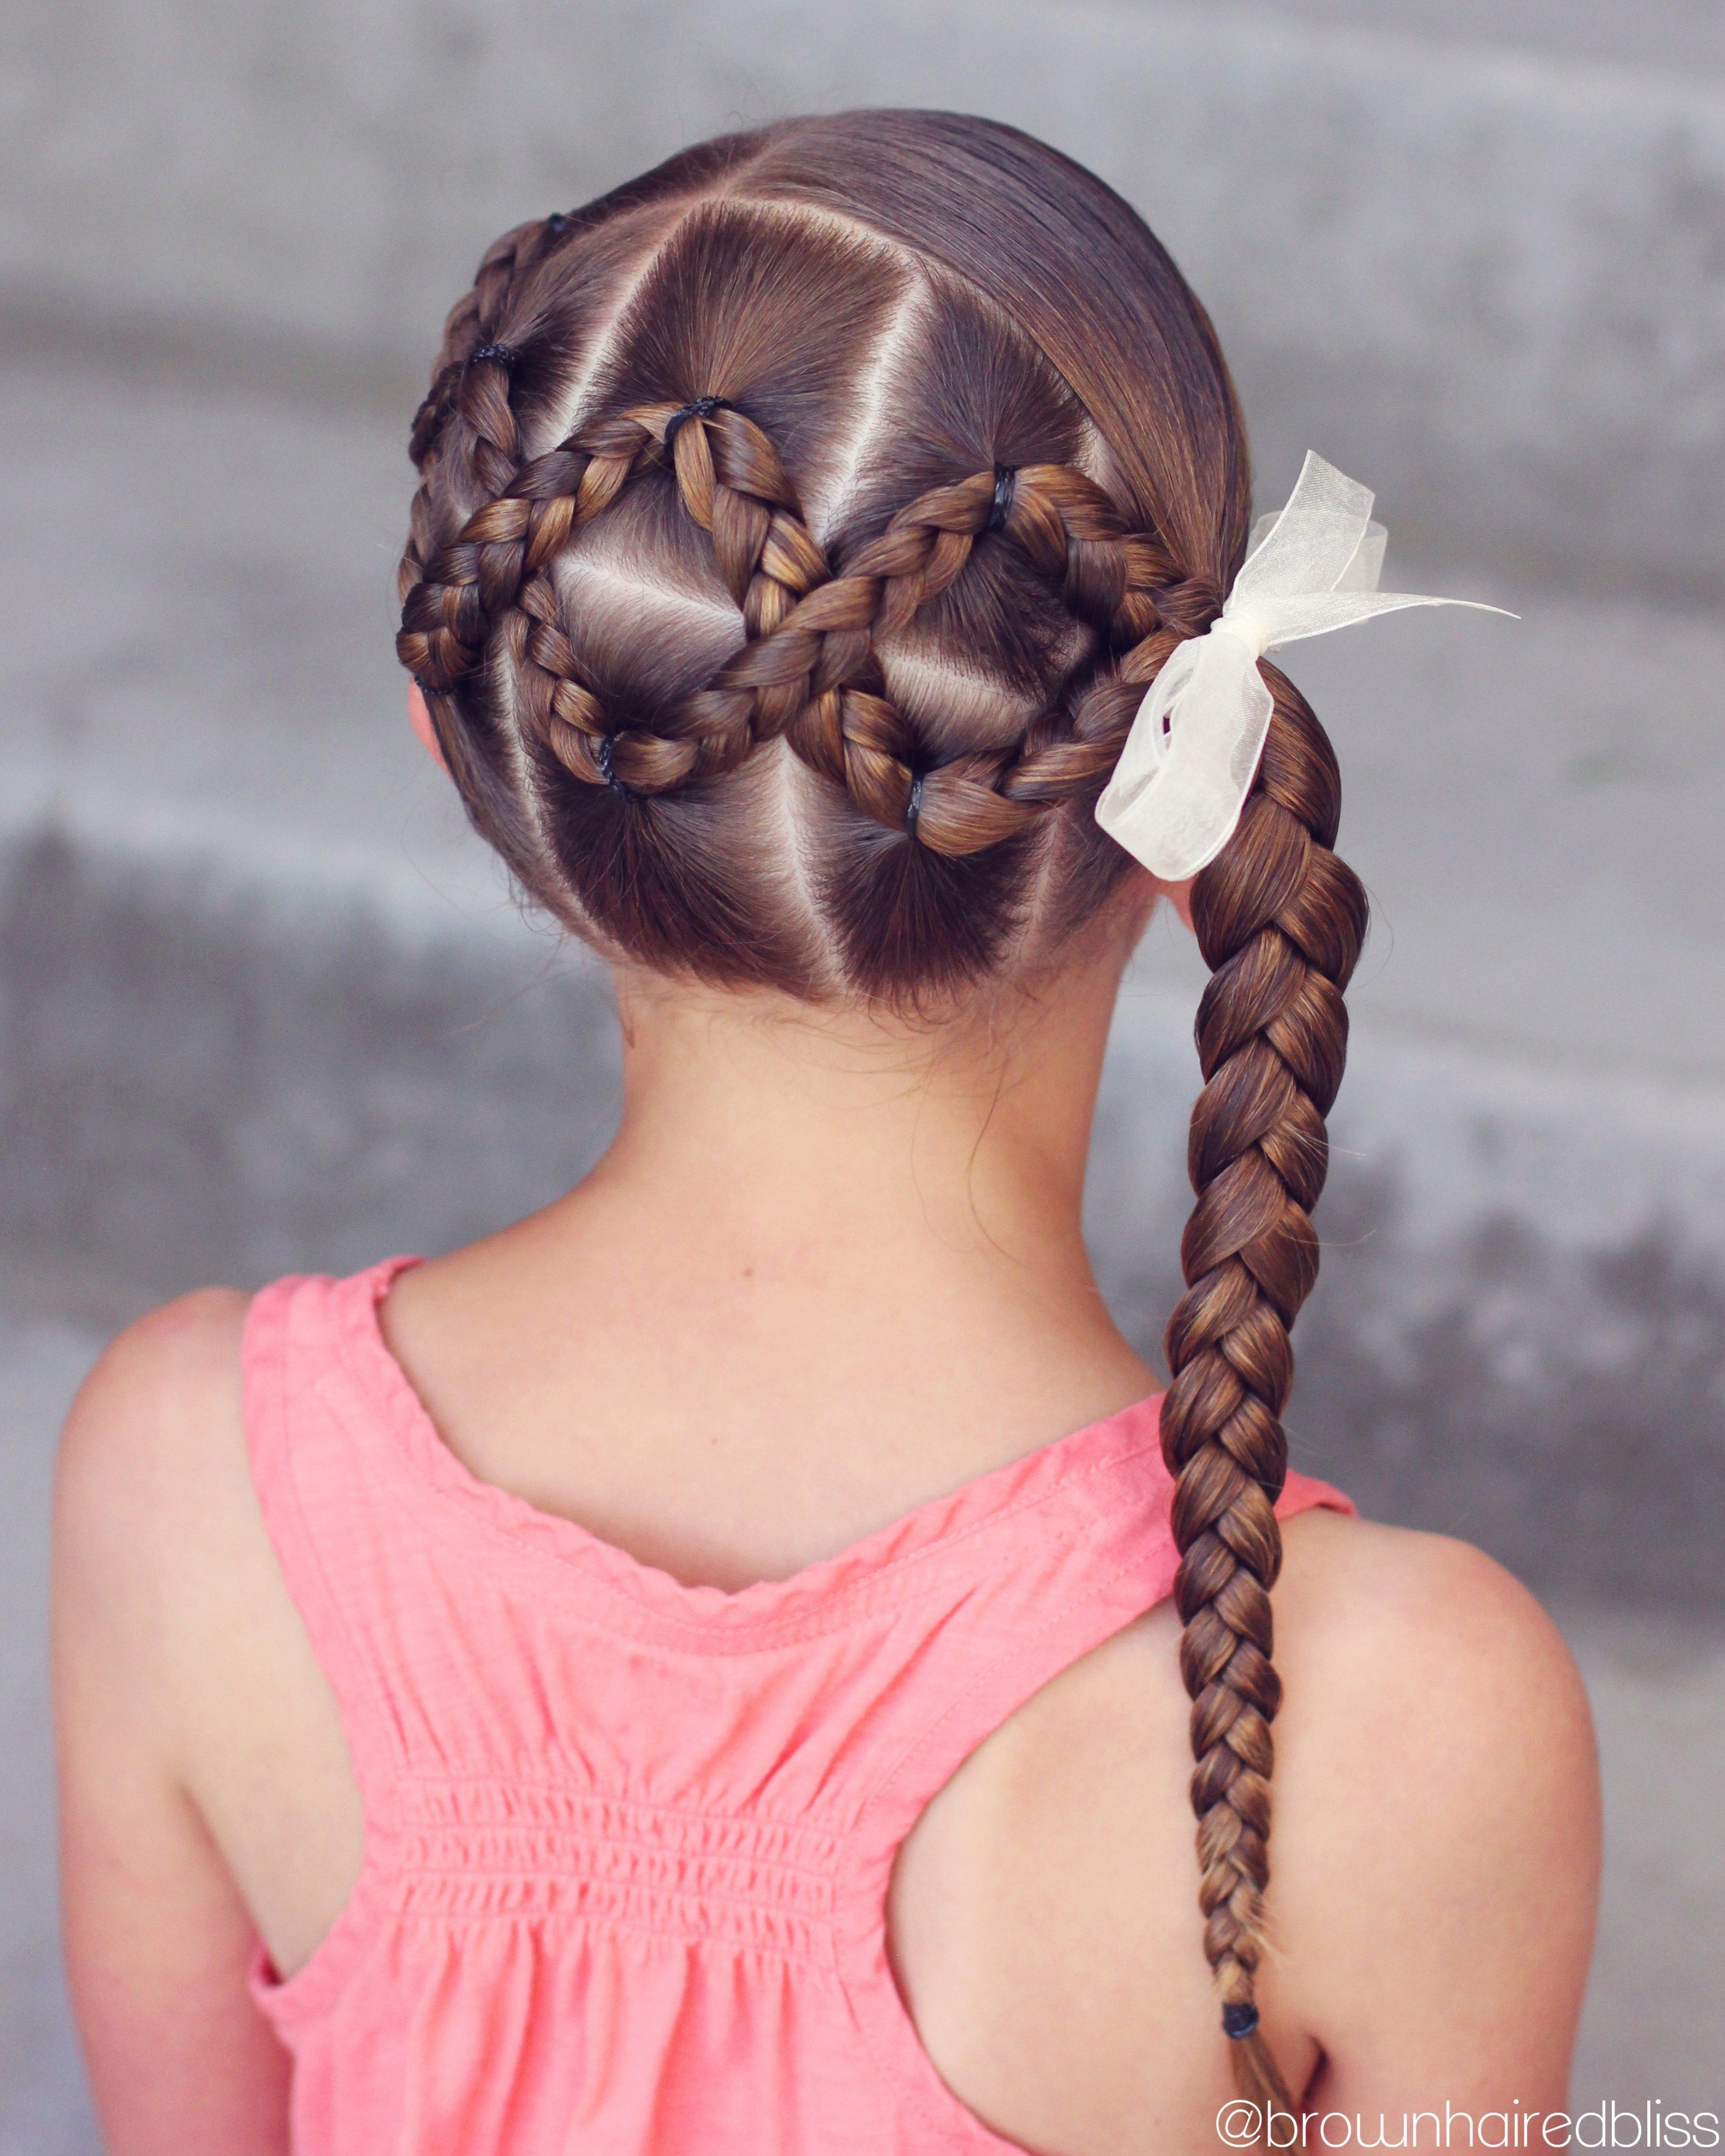 Peinado Con Gomitas Kids Braided Hairstyles Braided Hairstyles Long Hair Styles